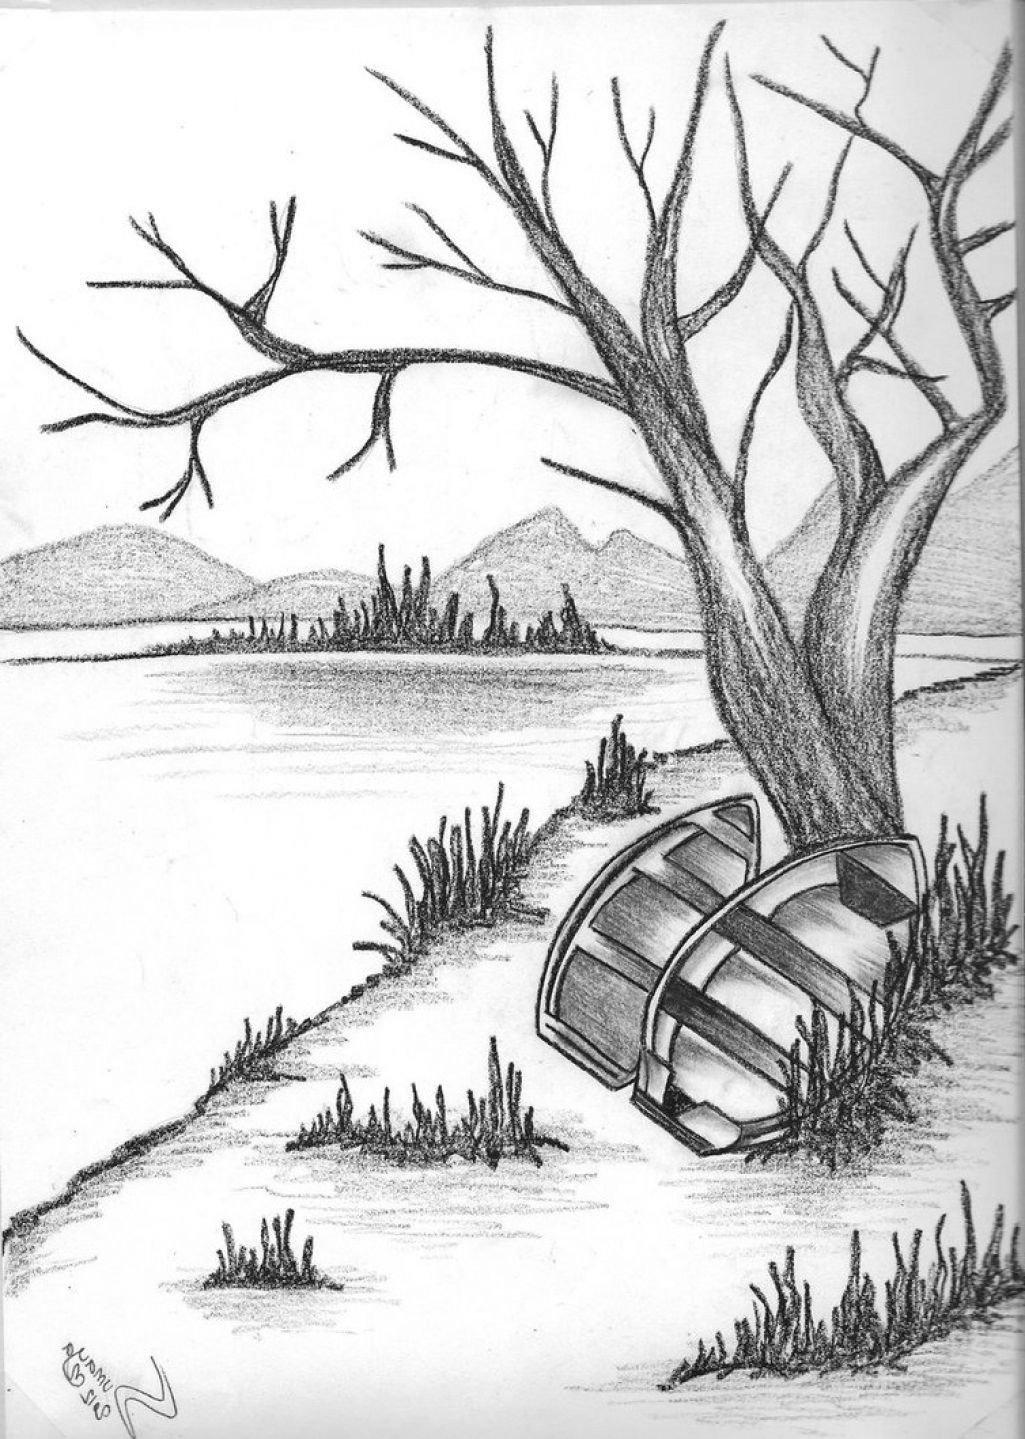 Beautiful Drawings Of Nature Pencil Drawing Natural Scenery Simple Pencil Drawings